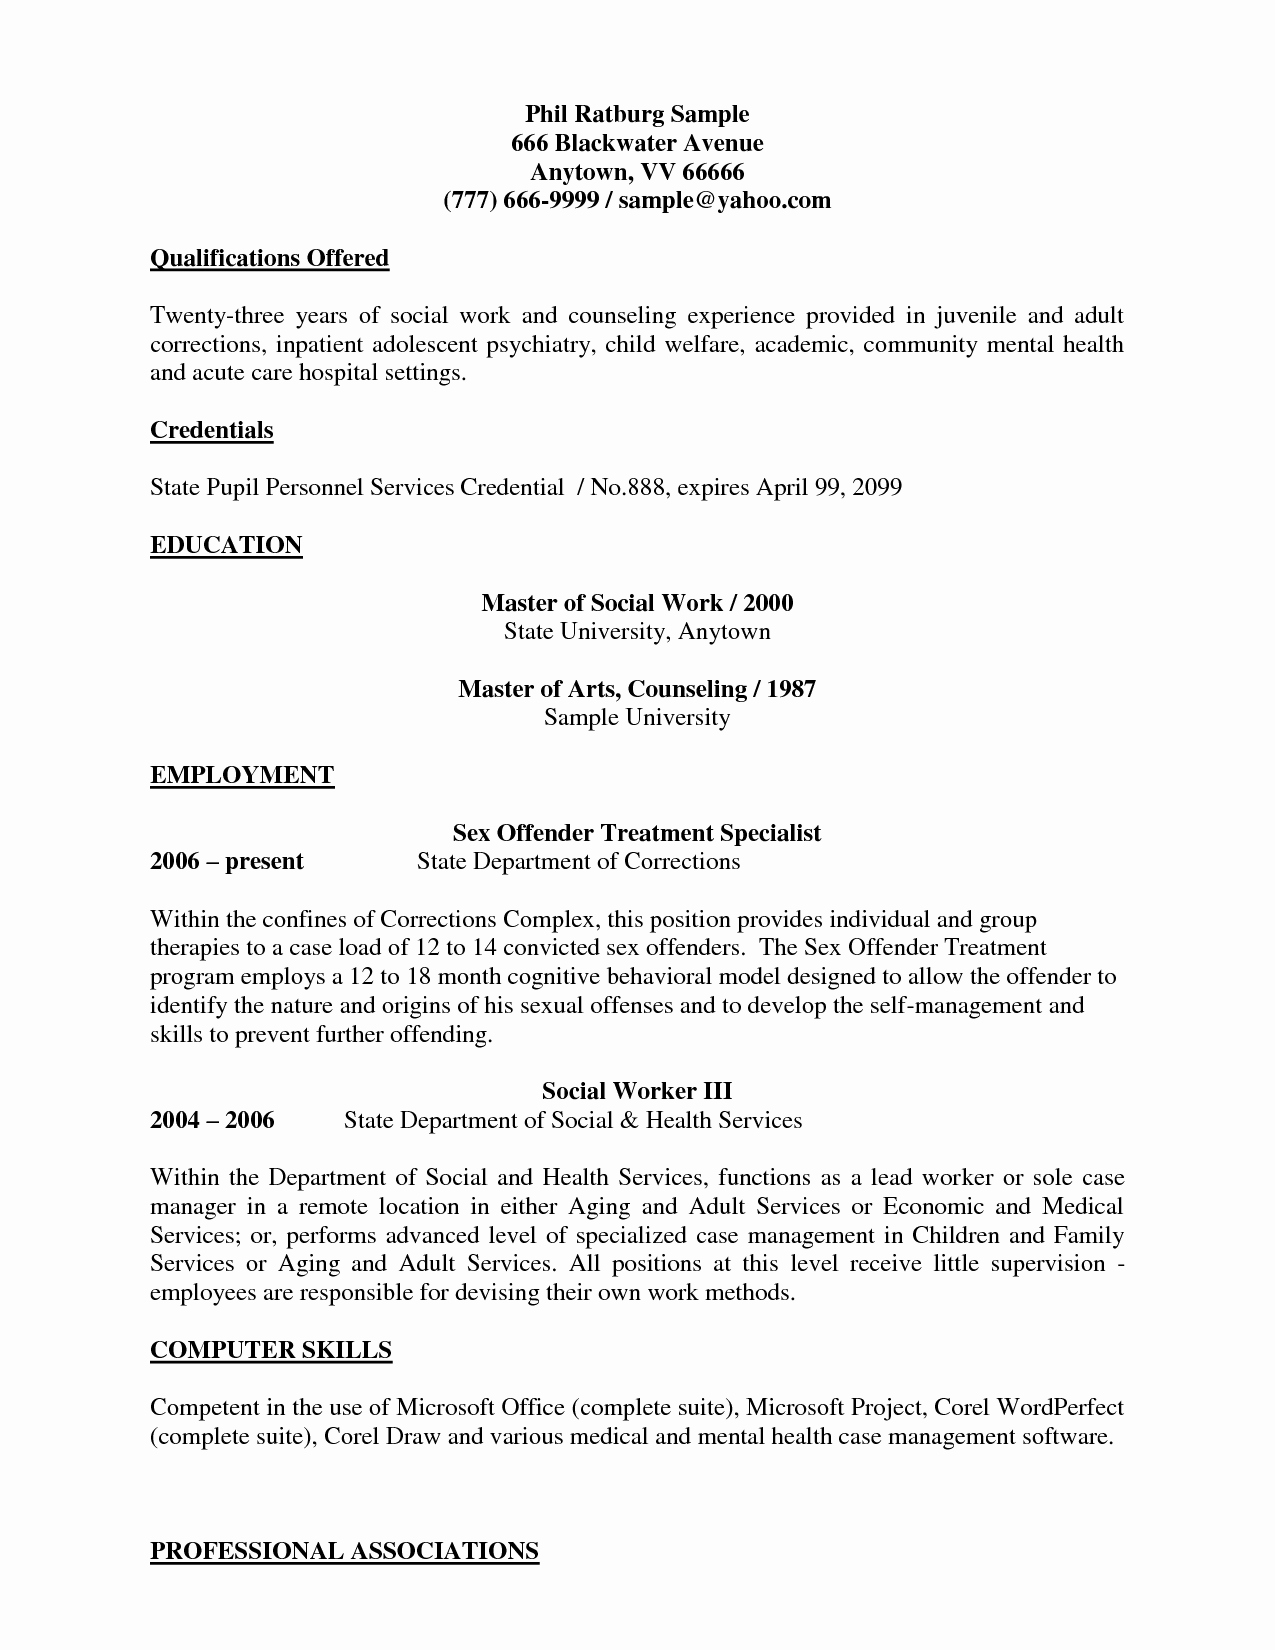 Sample social Work Resume Objectives Resume Ideas